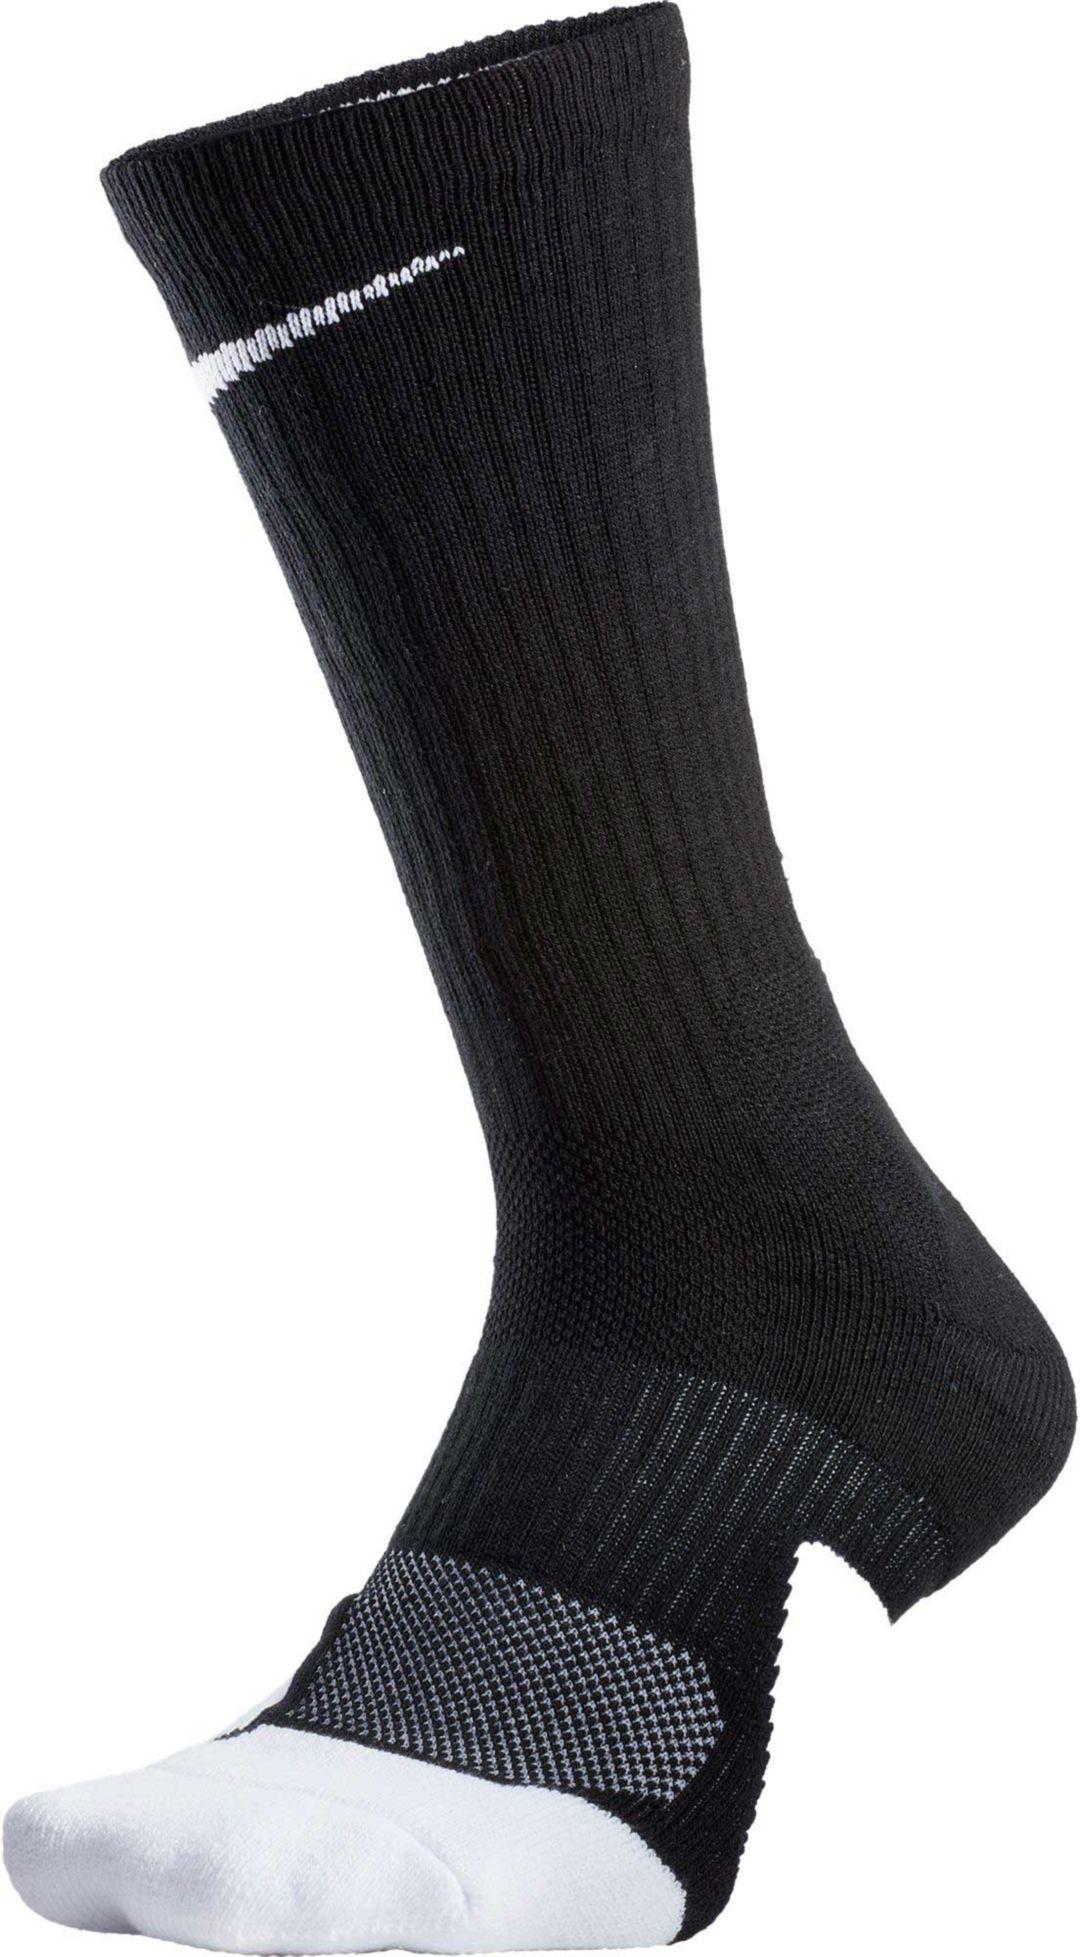 0f6a990a7f2c5 Nike Dry Elite 1.5 Crew Basketball Socks